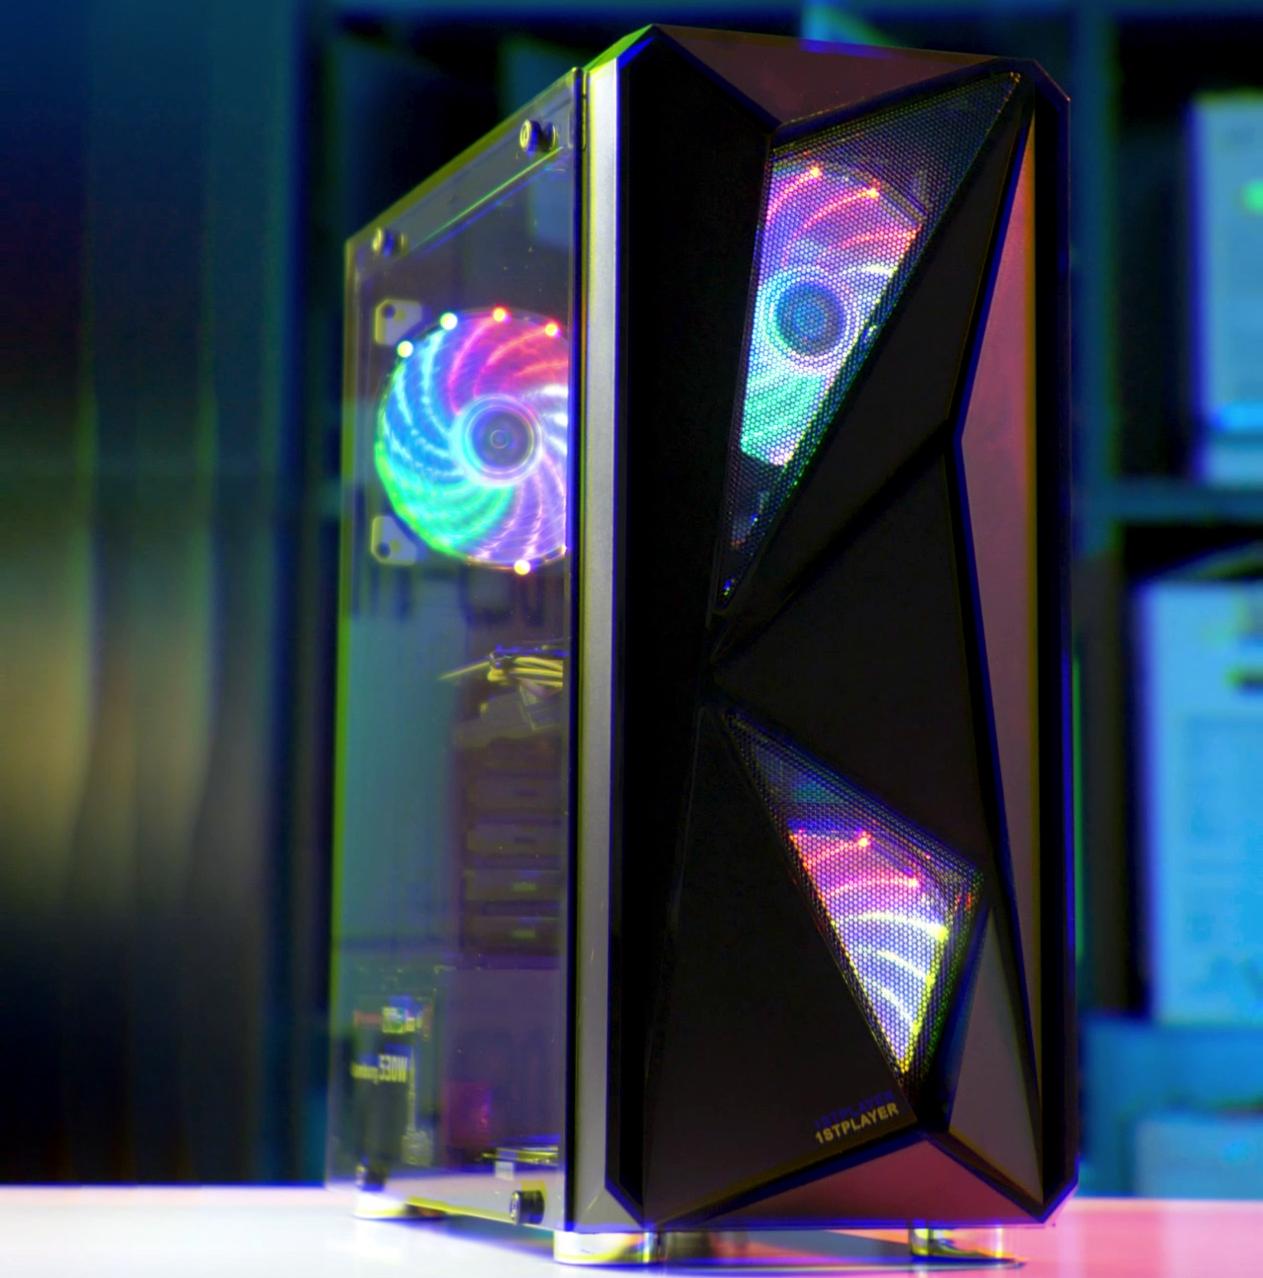 Игровой компьютер Вихрь 2.0 (Intel Core i5-3470/GTX 1060 3Gb/RAM 8Gb/SSD 120Gb/HDD 500Gb)